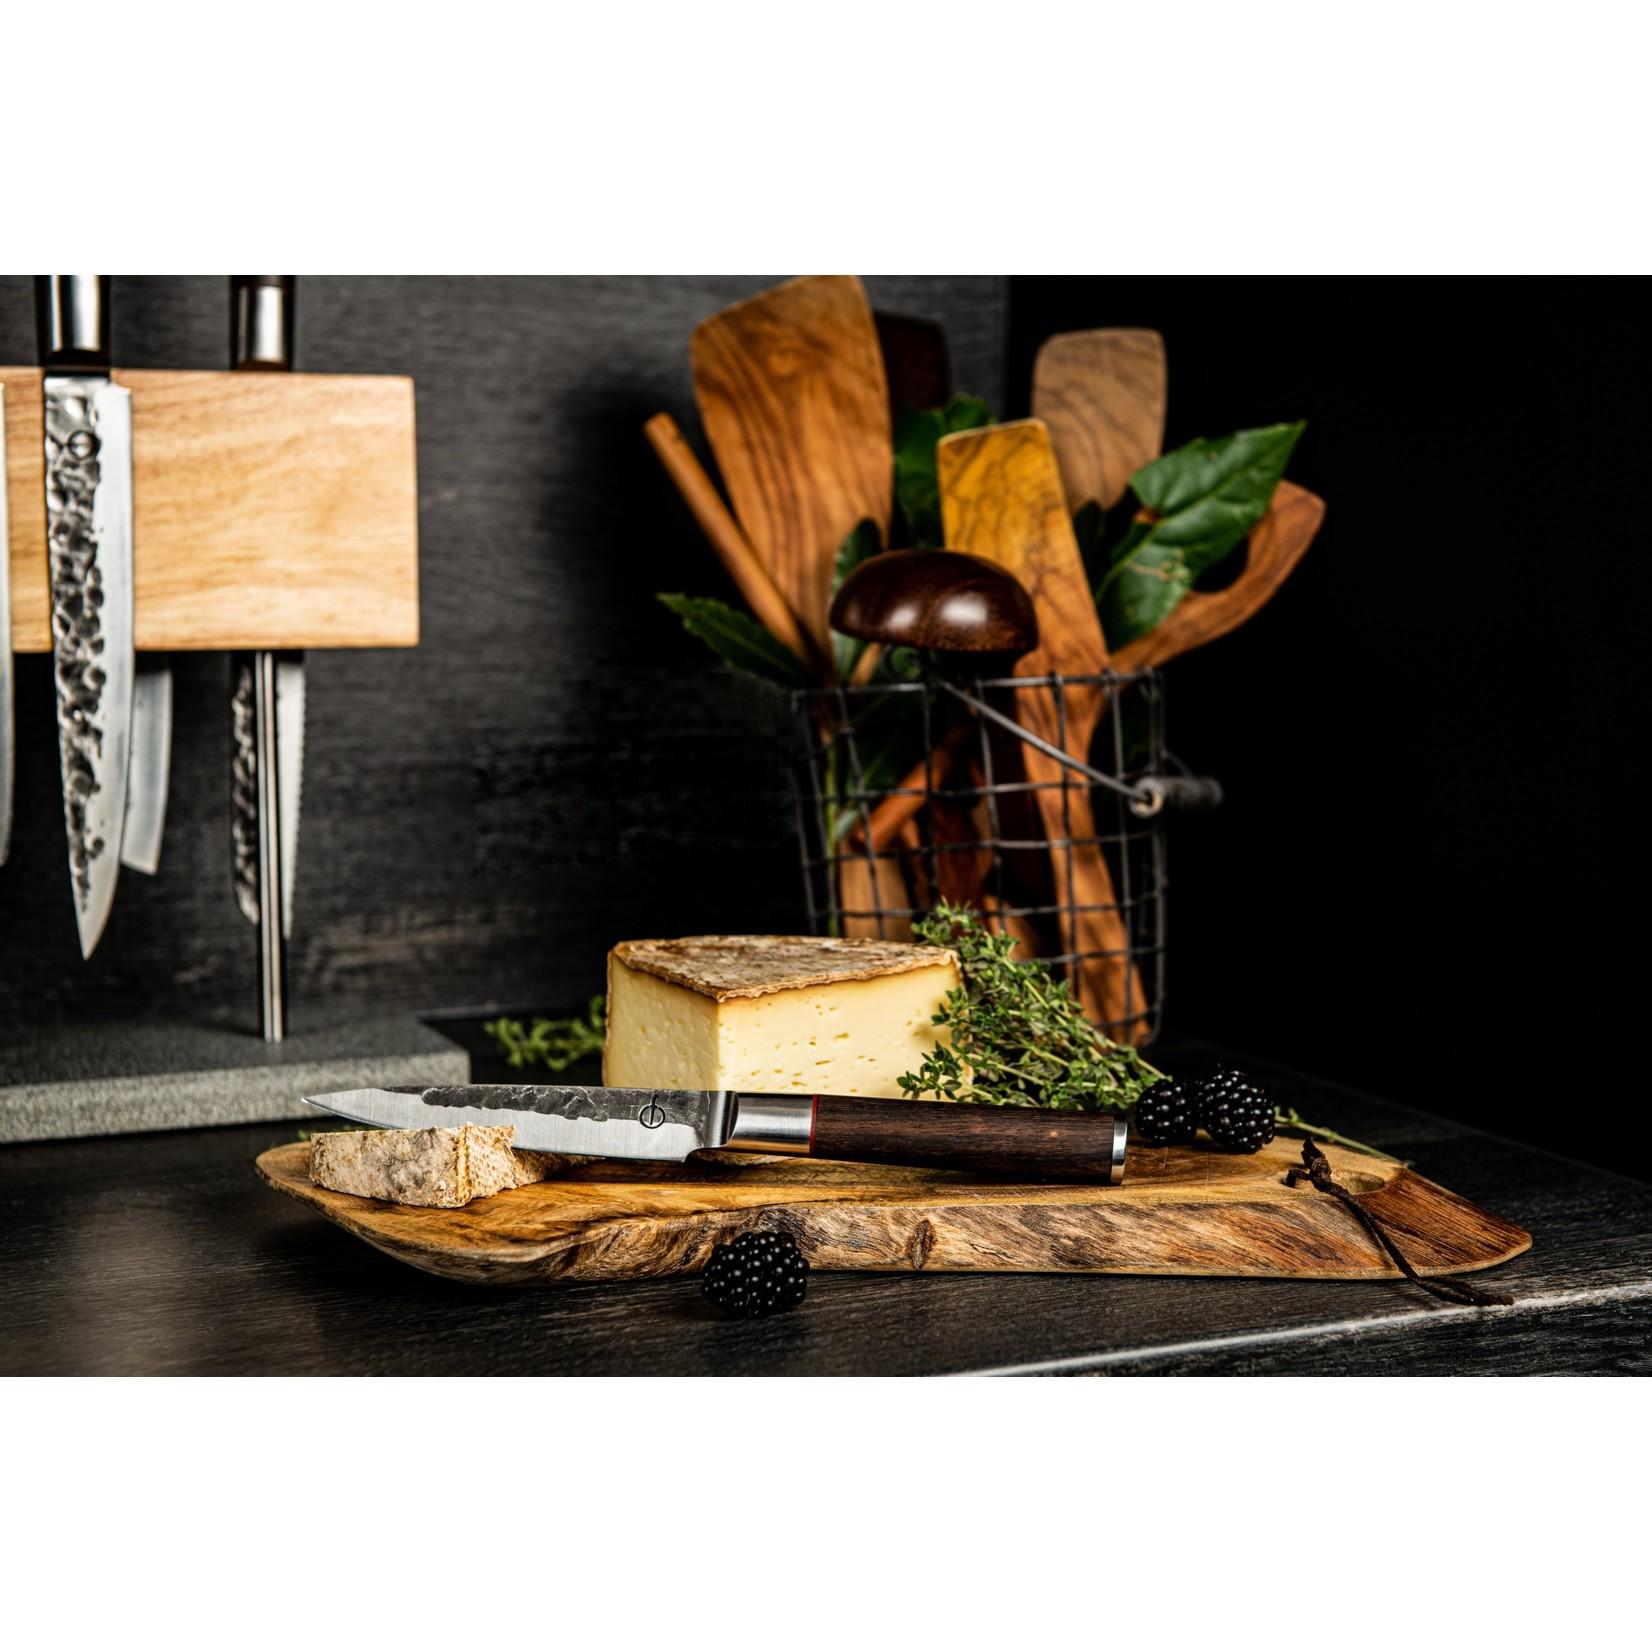 Forged Forged Sebra universeel keukenmes 12cm